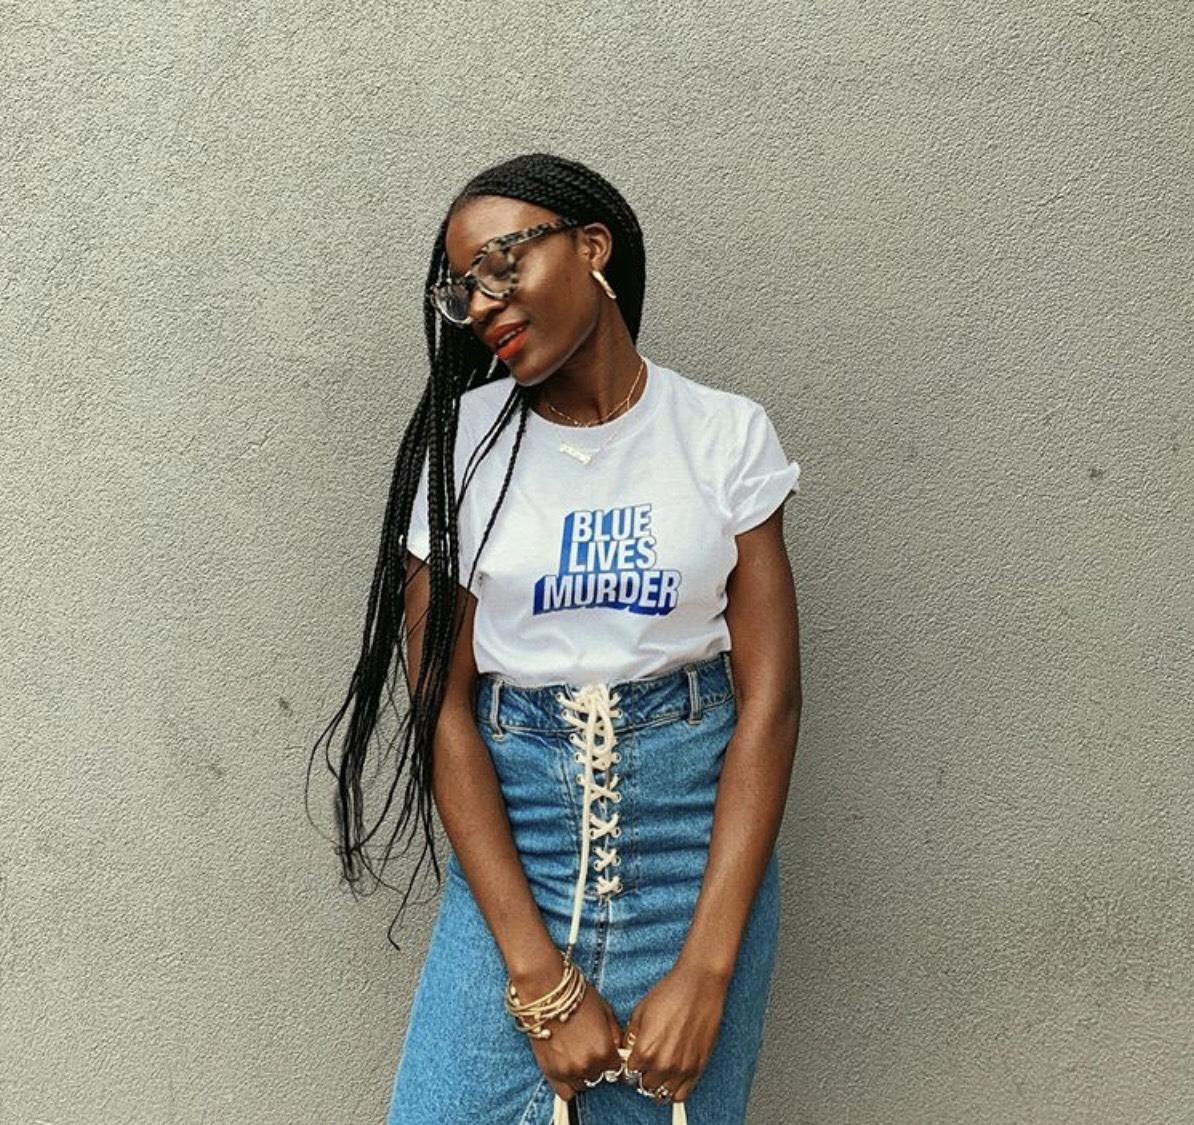 White Blue Lives Murder Shirt   (worn by Baltimore based writer, researcher, organizer, and womanist born in Liberia, West Africa, Bilphena Yahwon,    @goldwomyn   )